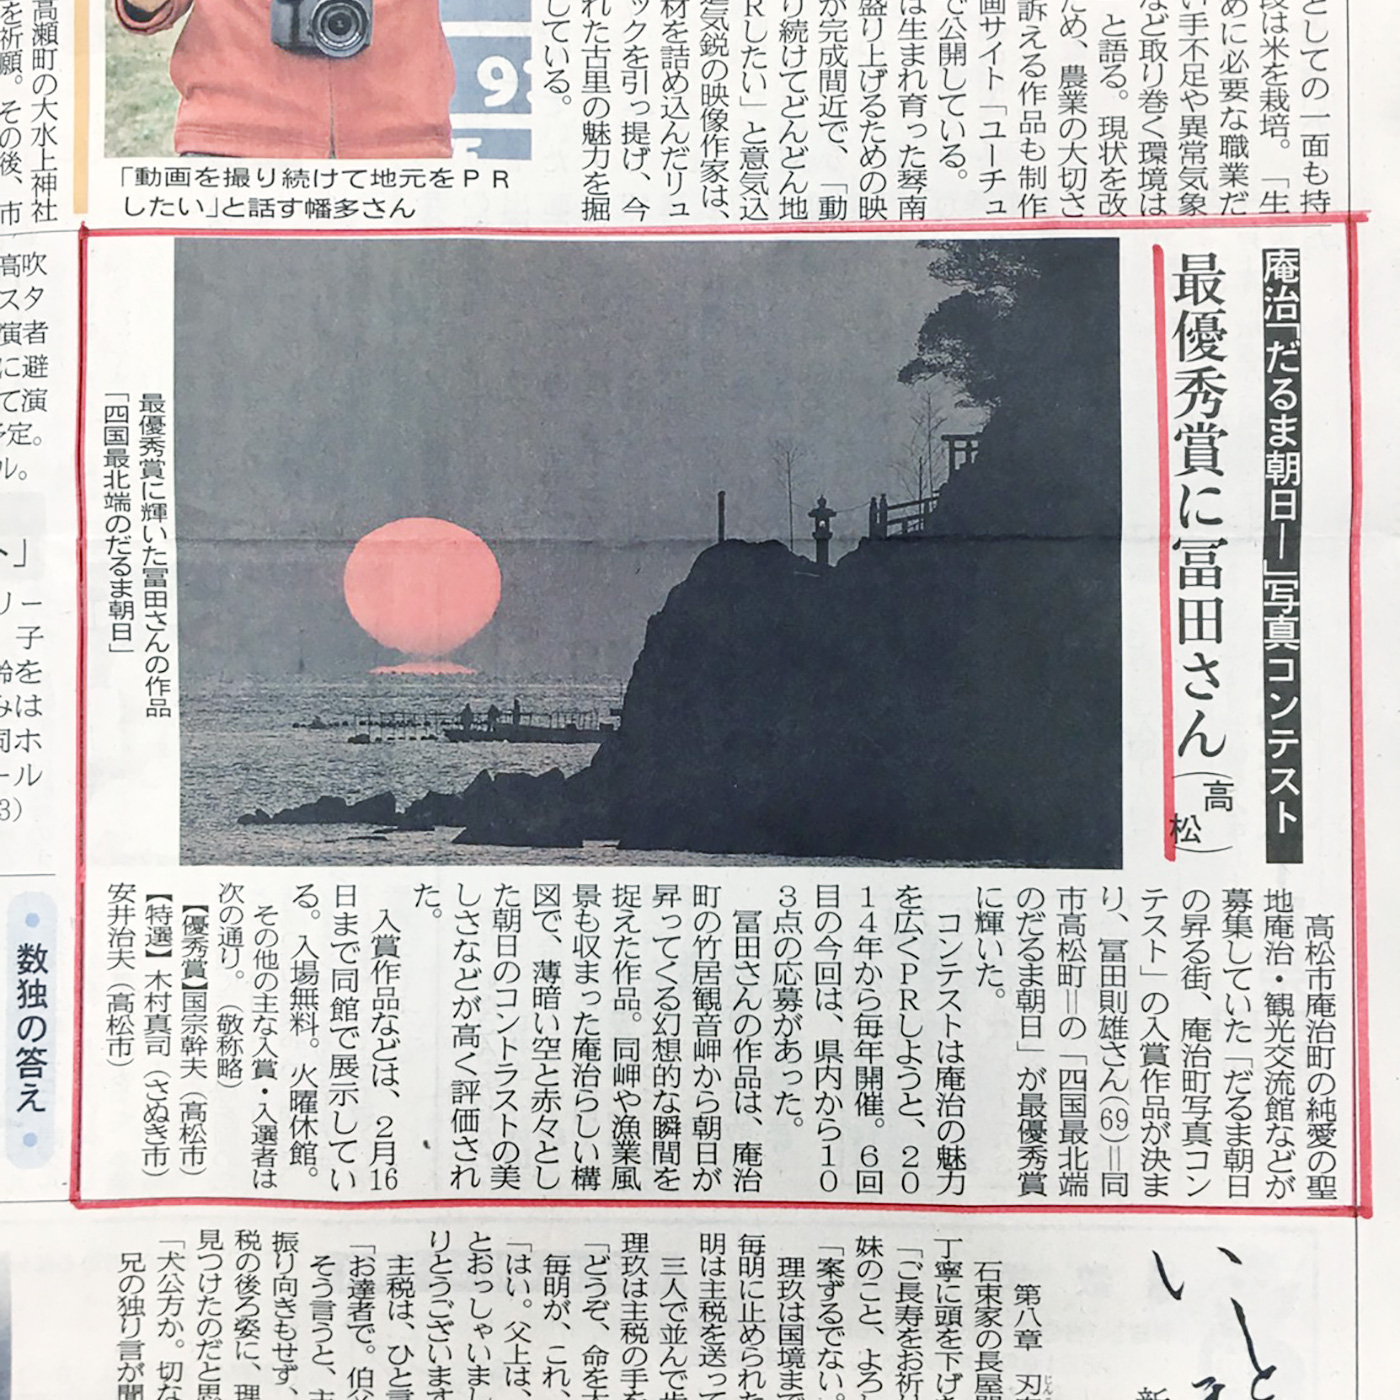 結果発表 新聞記事 - 四国新聞さん